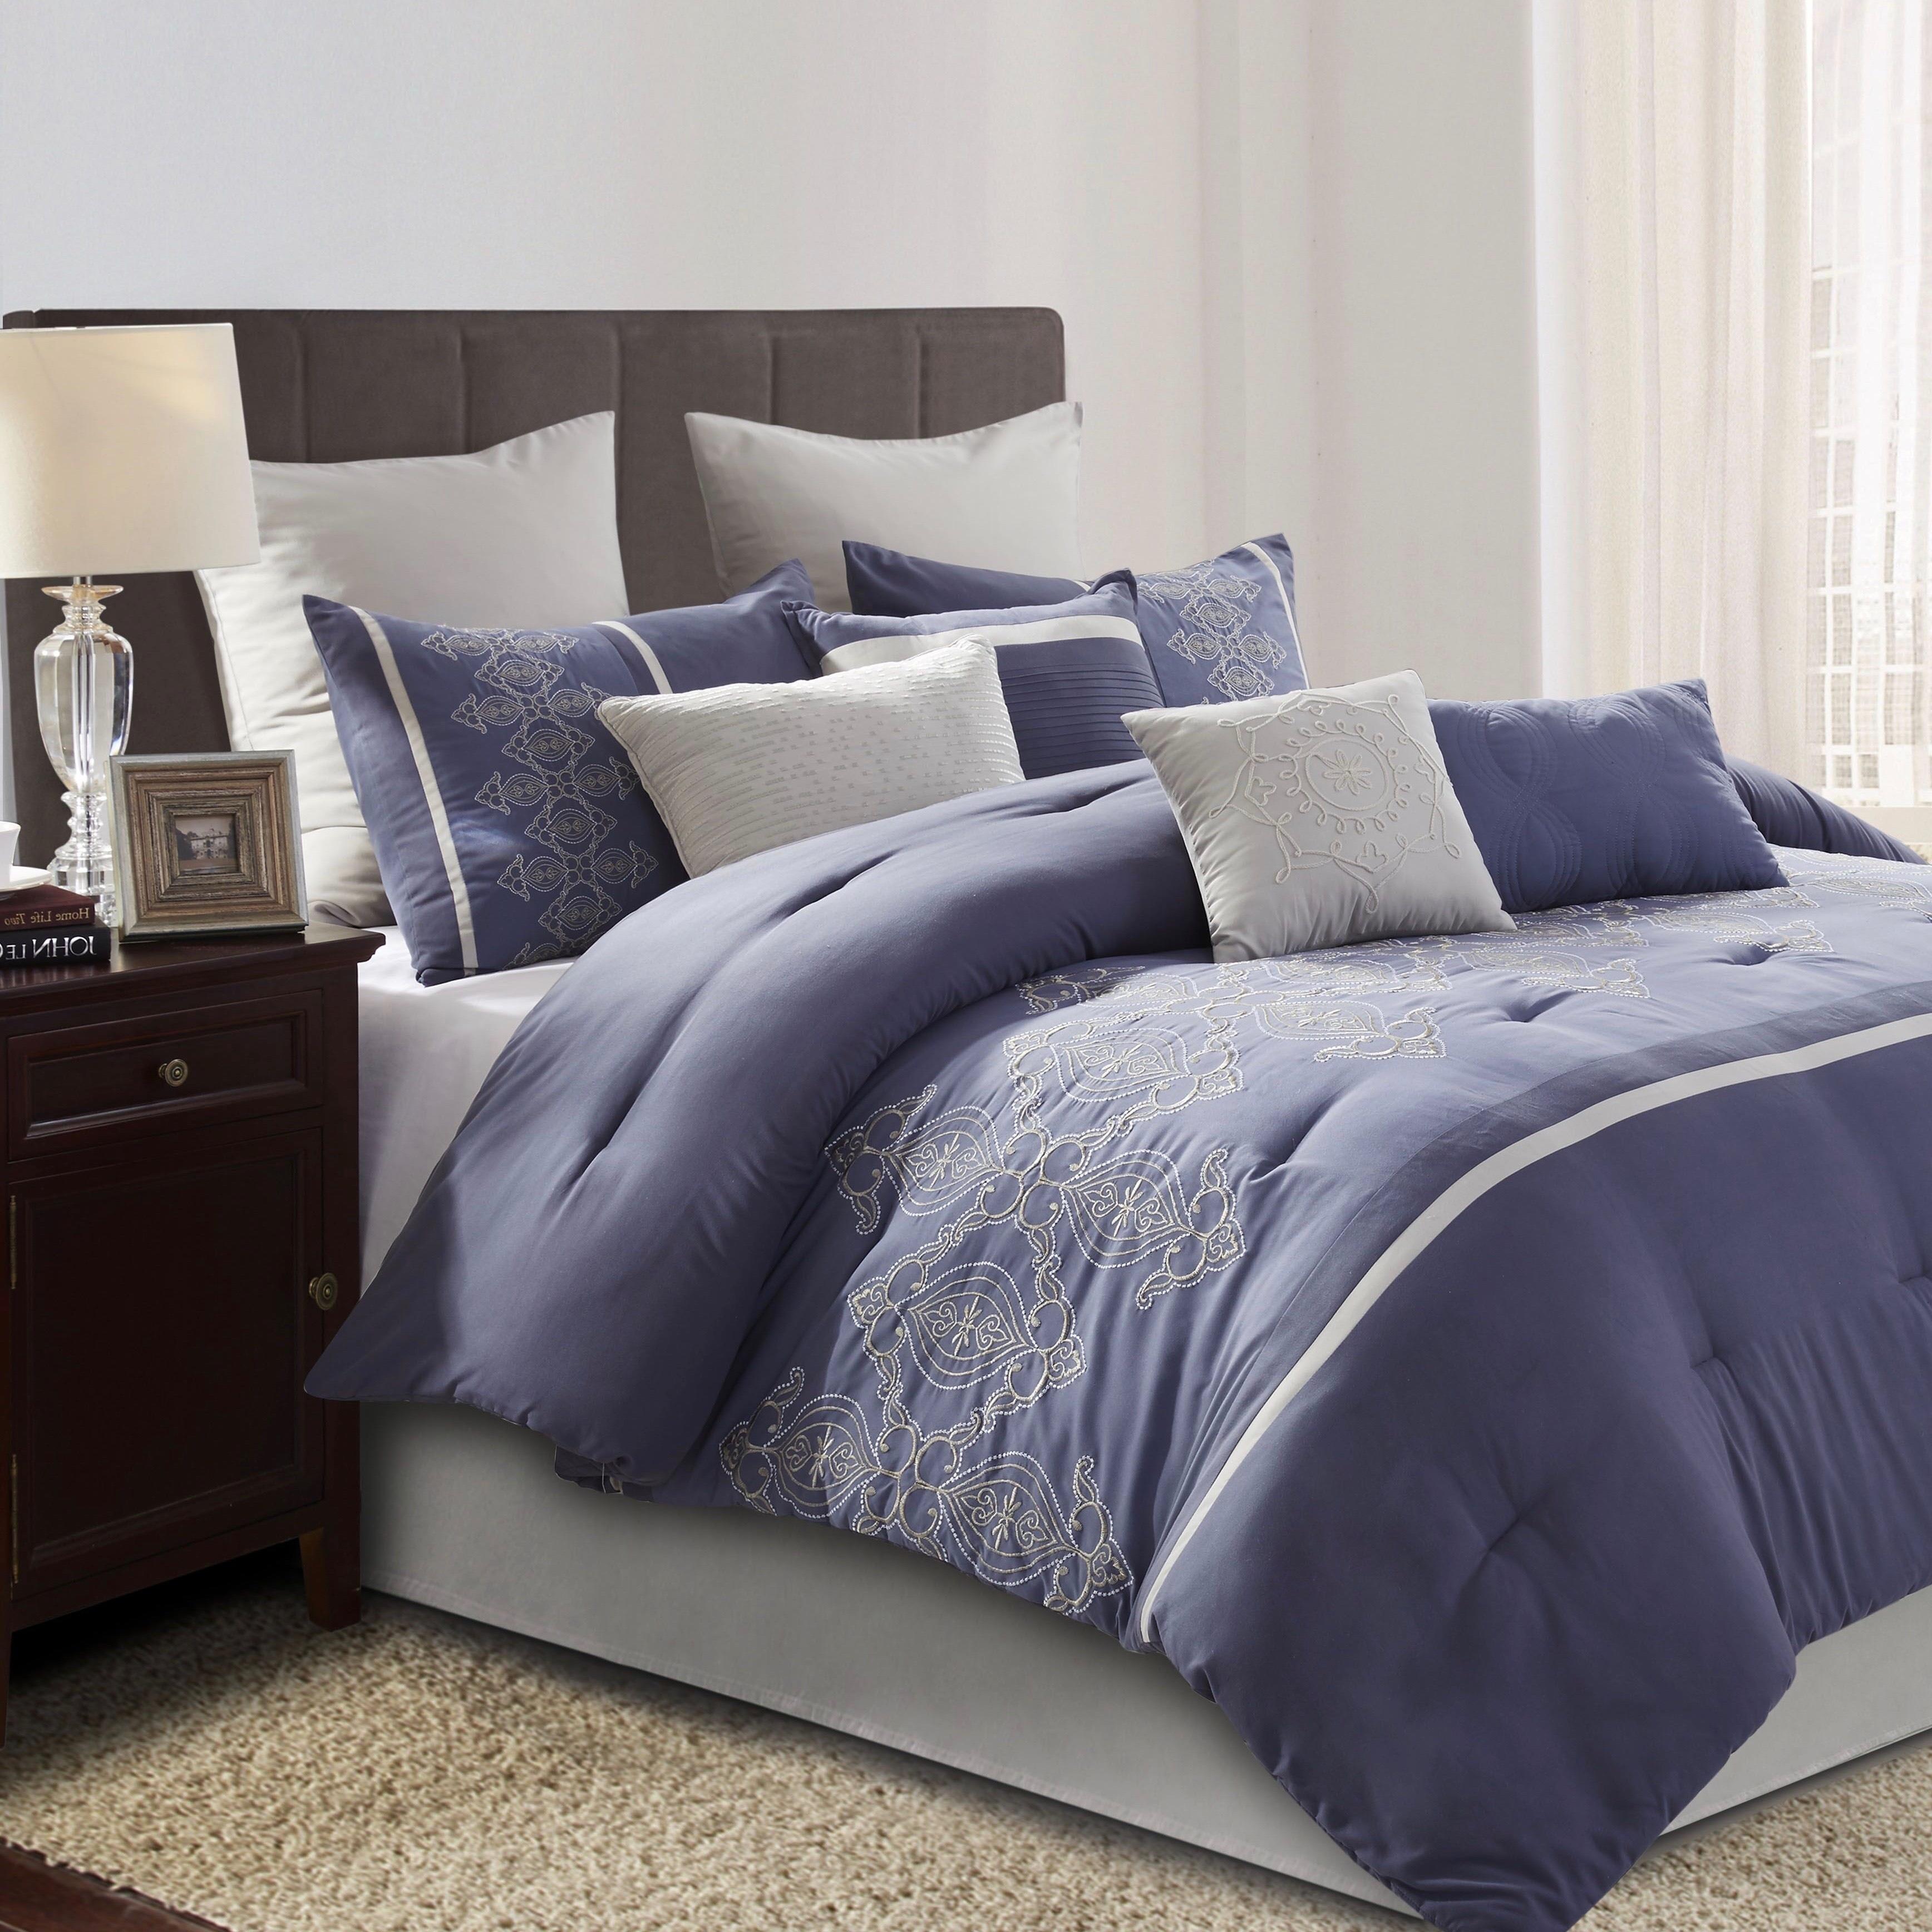 4f5060fd3 Style Decor Audrey 10-piece Embellished Complete Comforter Set